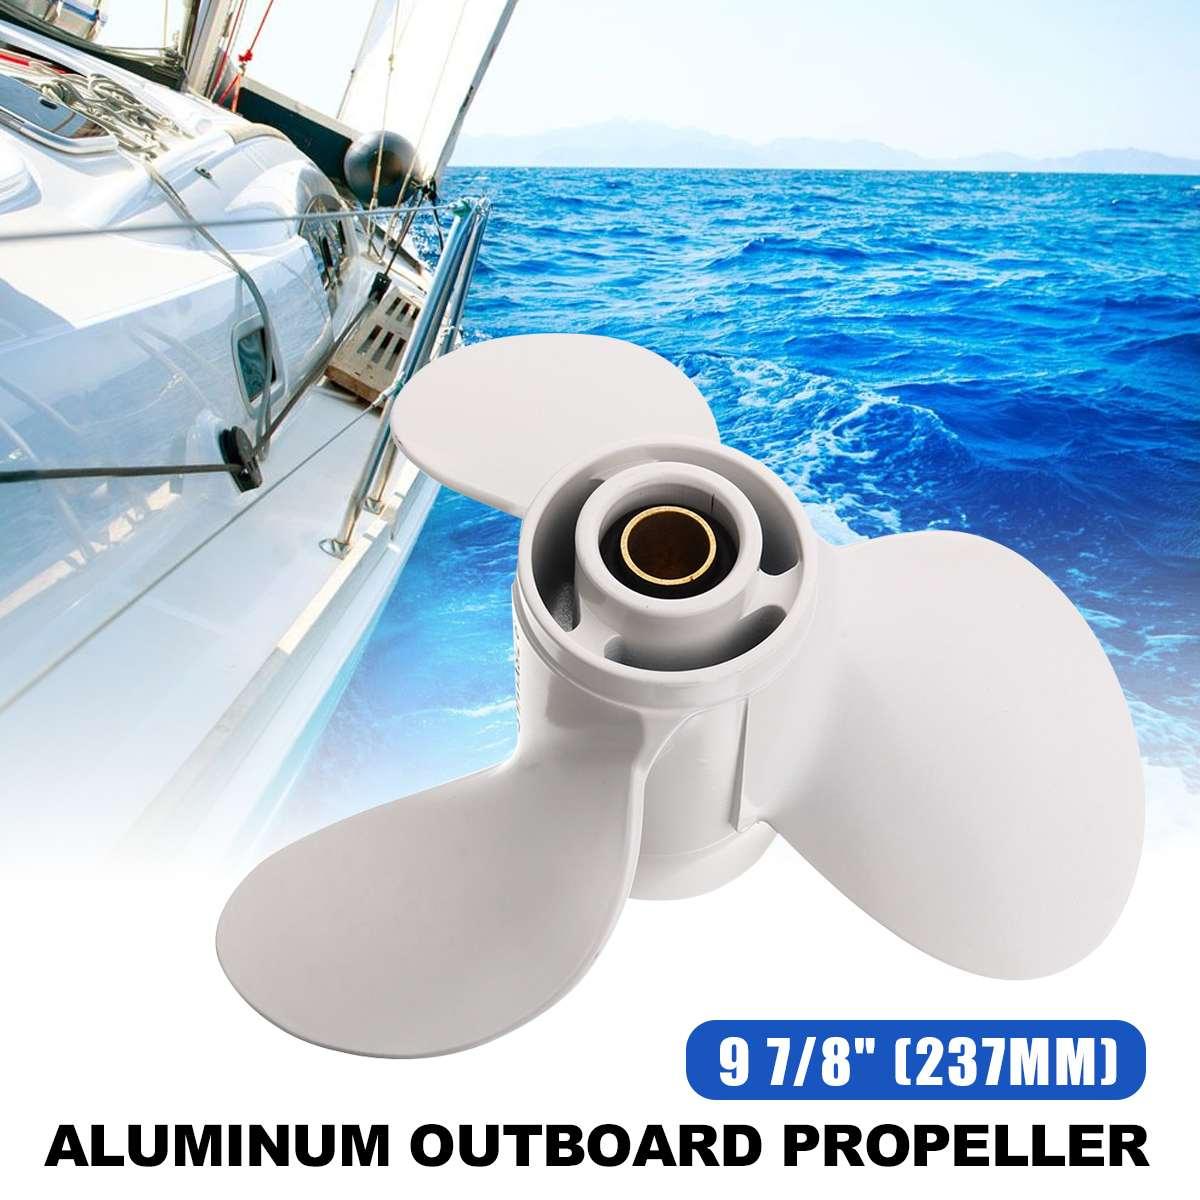 664-45947-01-EL 9 7/8 x 11 1/4 Aluminium alloy Boat Outboard Propeller For Yamaha 20-30HP White 10 Spline Tooth 3 Blades664-45947-01-EL 9 7/8 x 11 1/4 Aluminium alloy Boat Outboard Propeller For Yamaha 20-30HP White 10 Spline Tooth 3 Blades